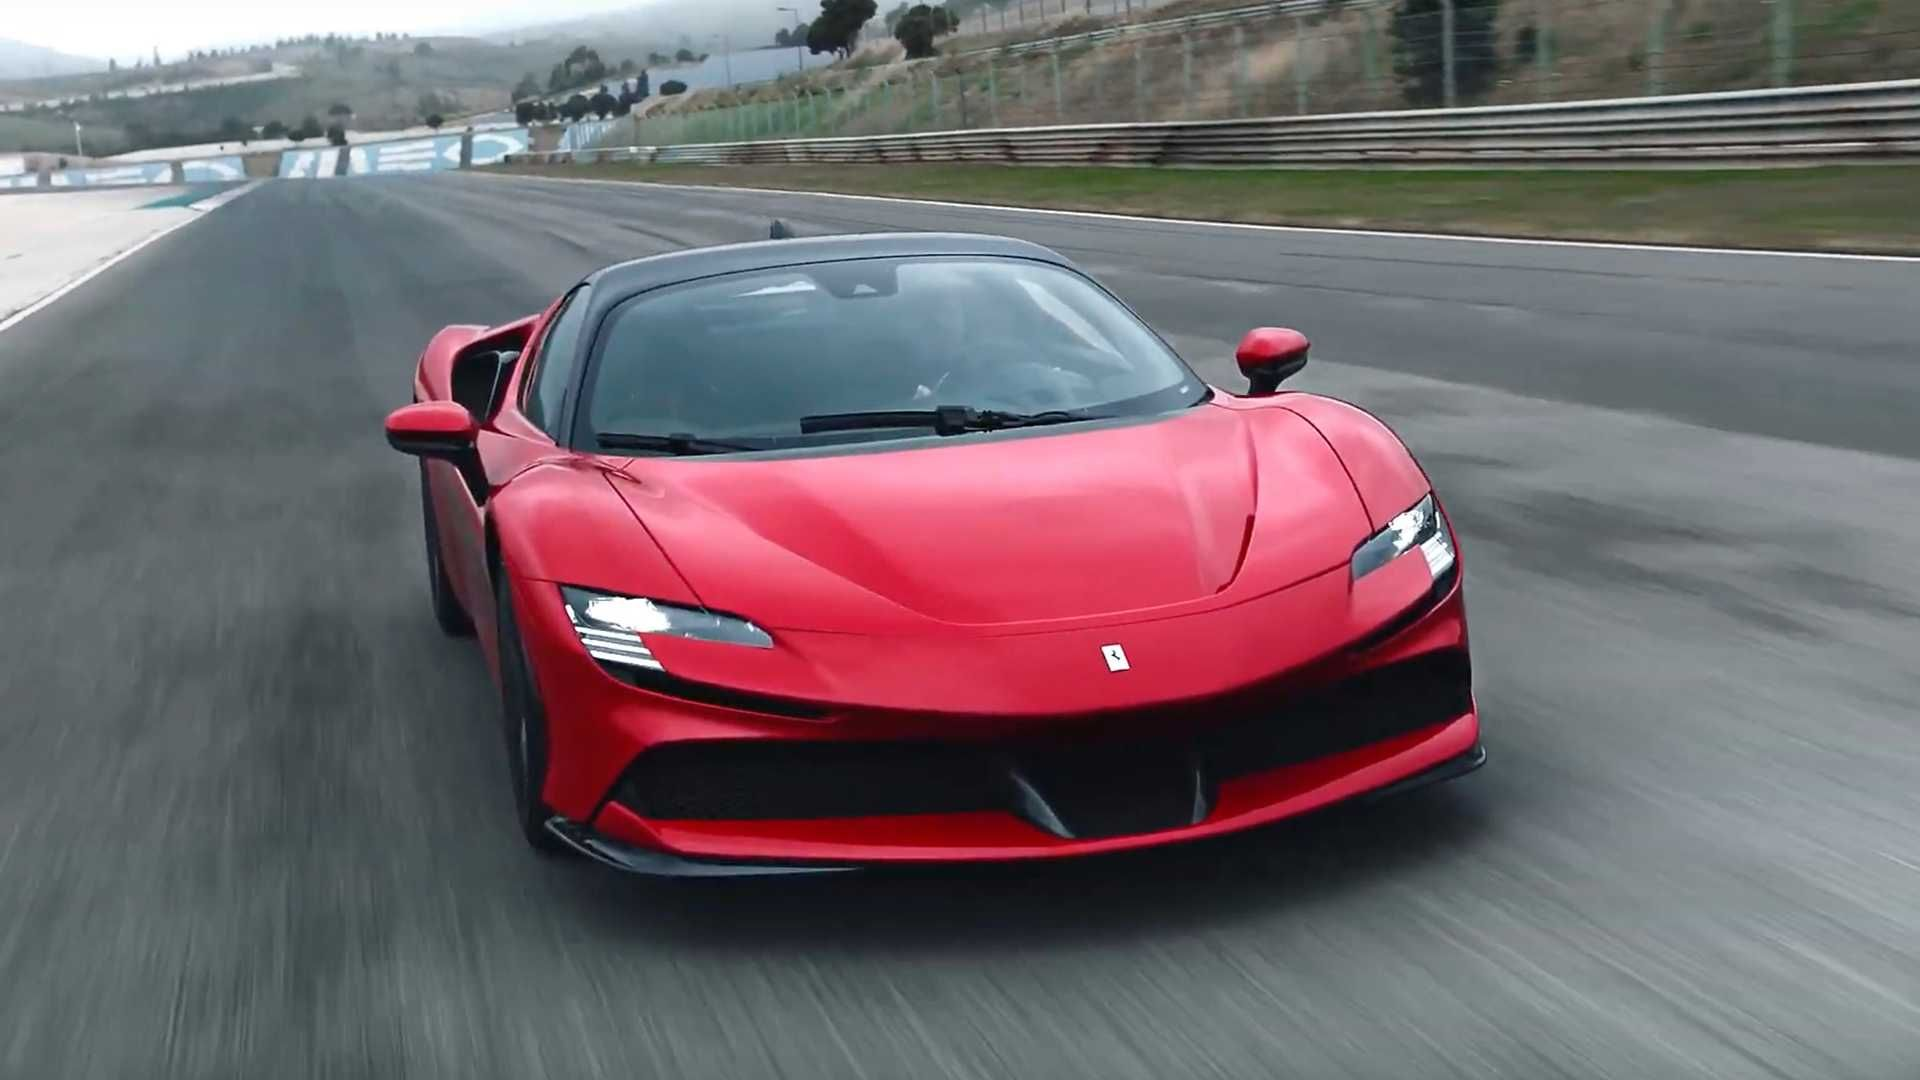 Ferrari Sf90 Stradale Build Slot Already For Sale For R21 Million New Ferrari Car Ferrari